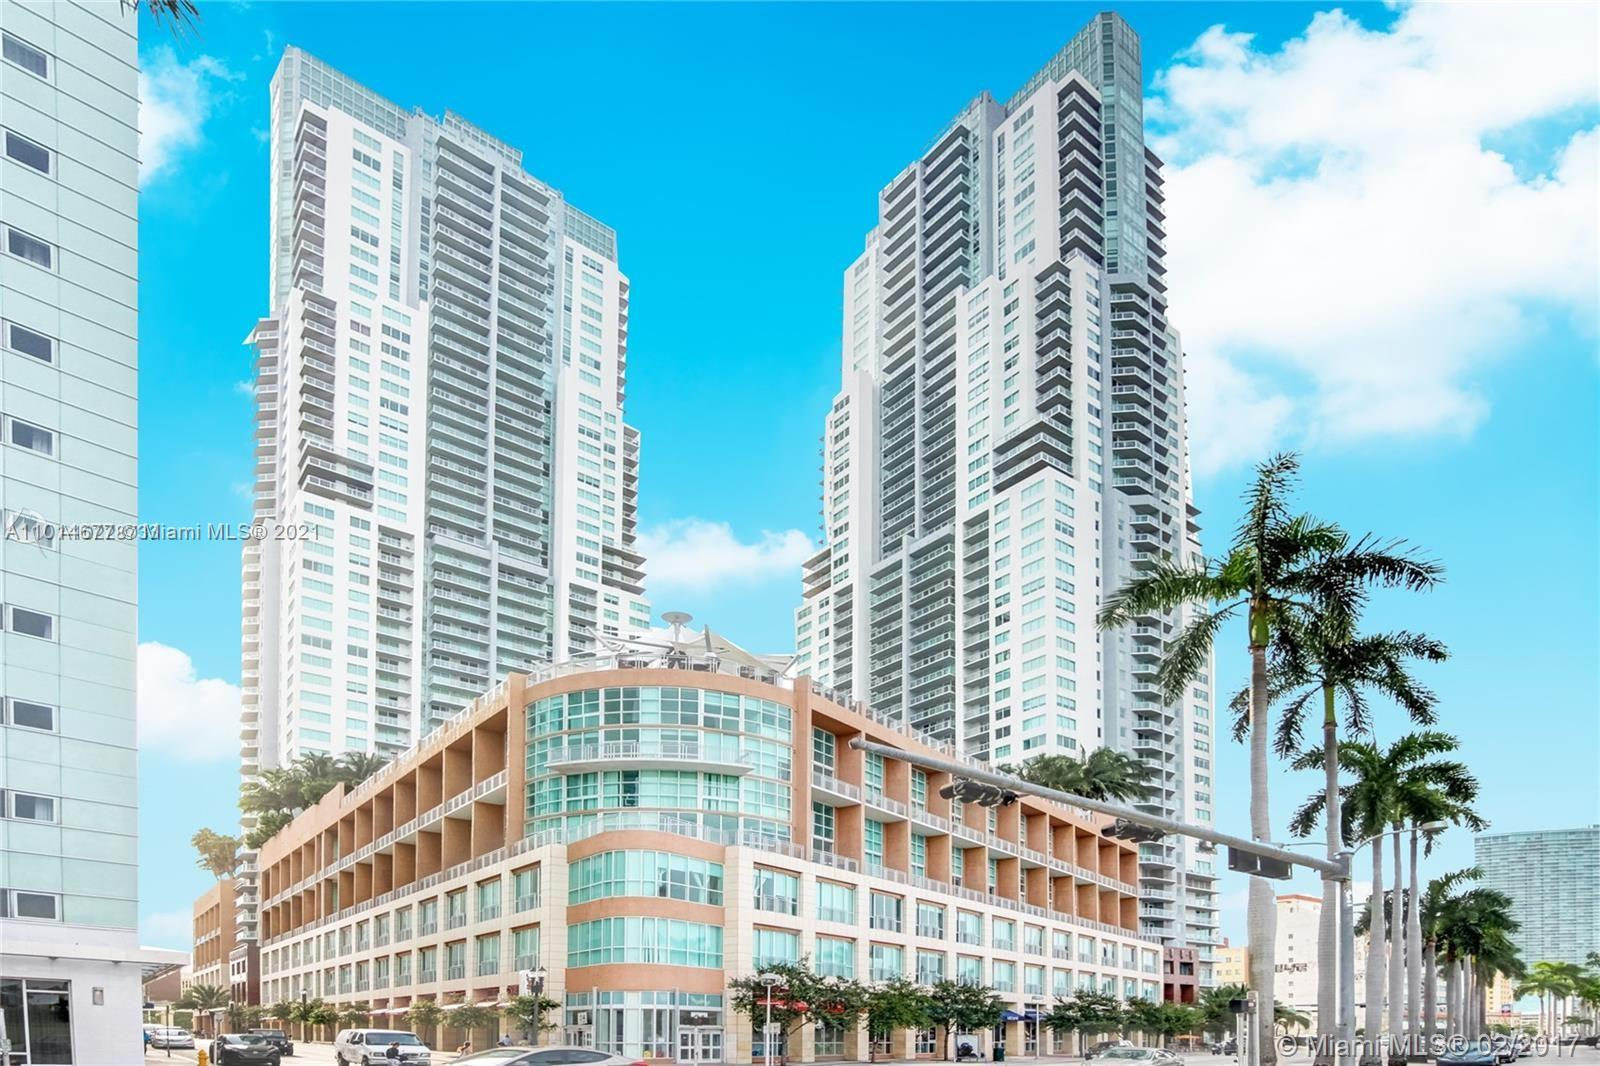 Vizcayne One #2109 - 244 Biscayne Blvd #2109, Miami, FL 33132